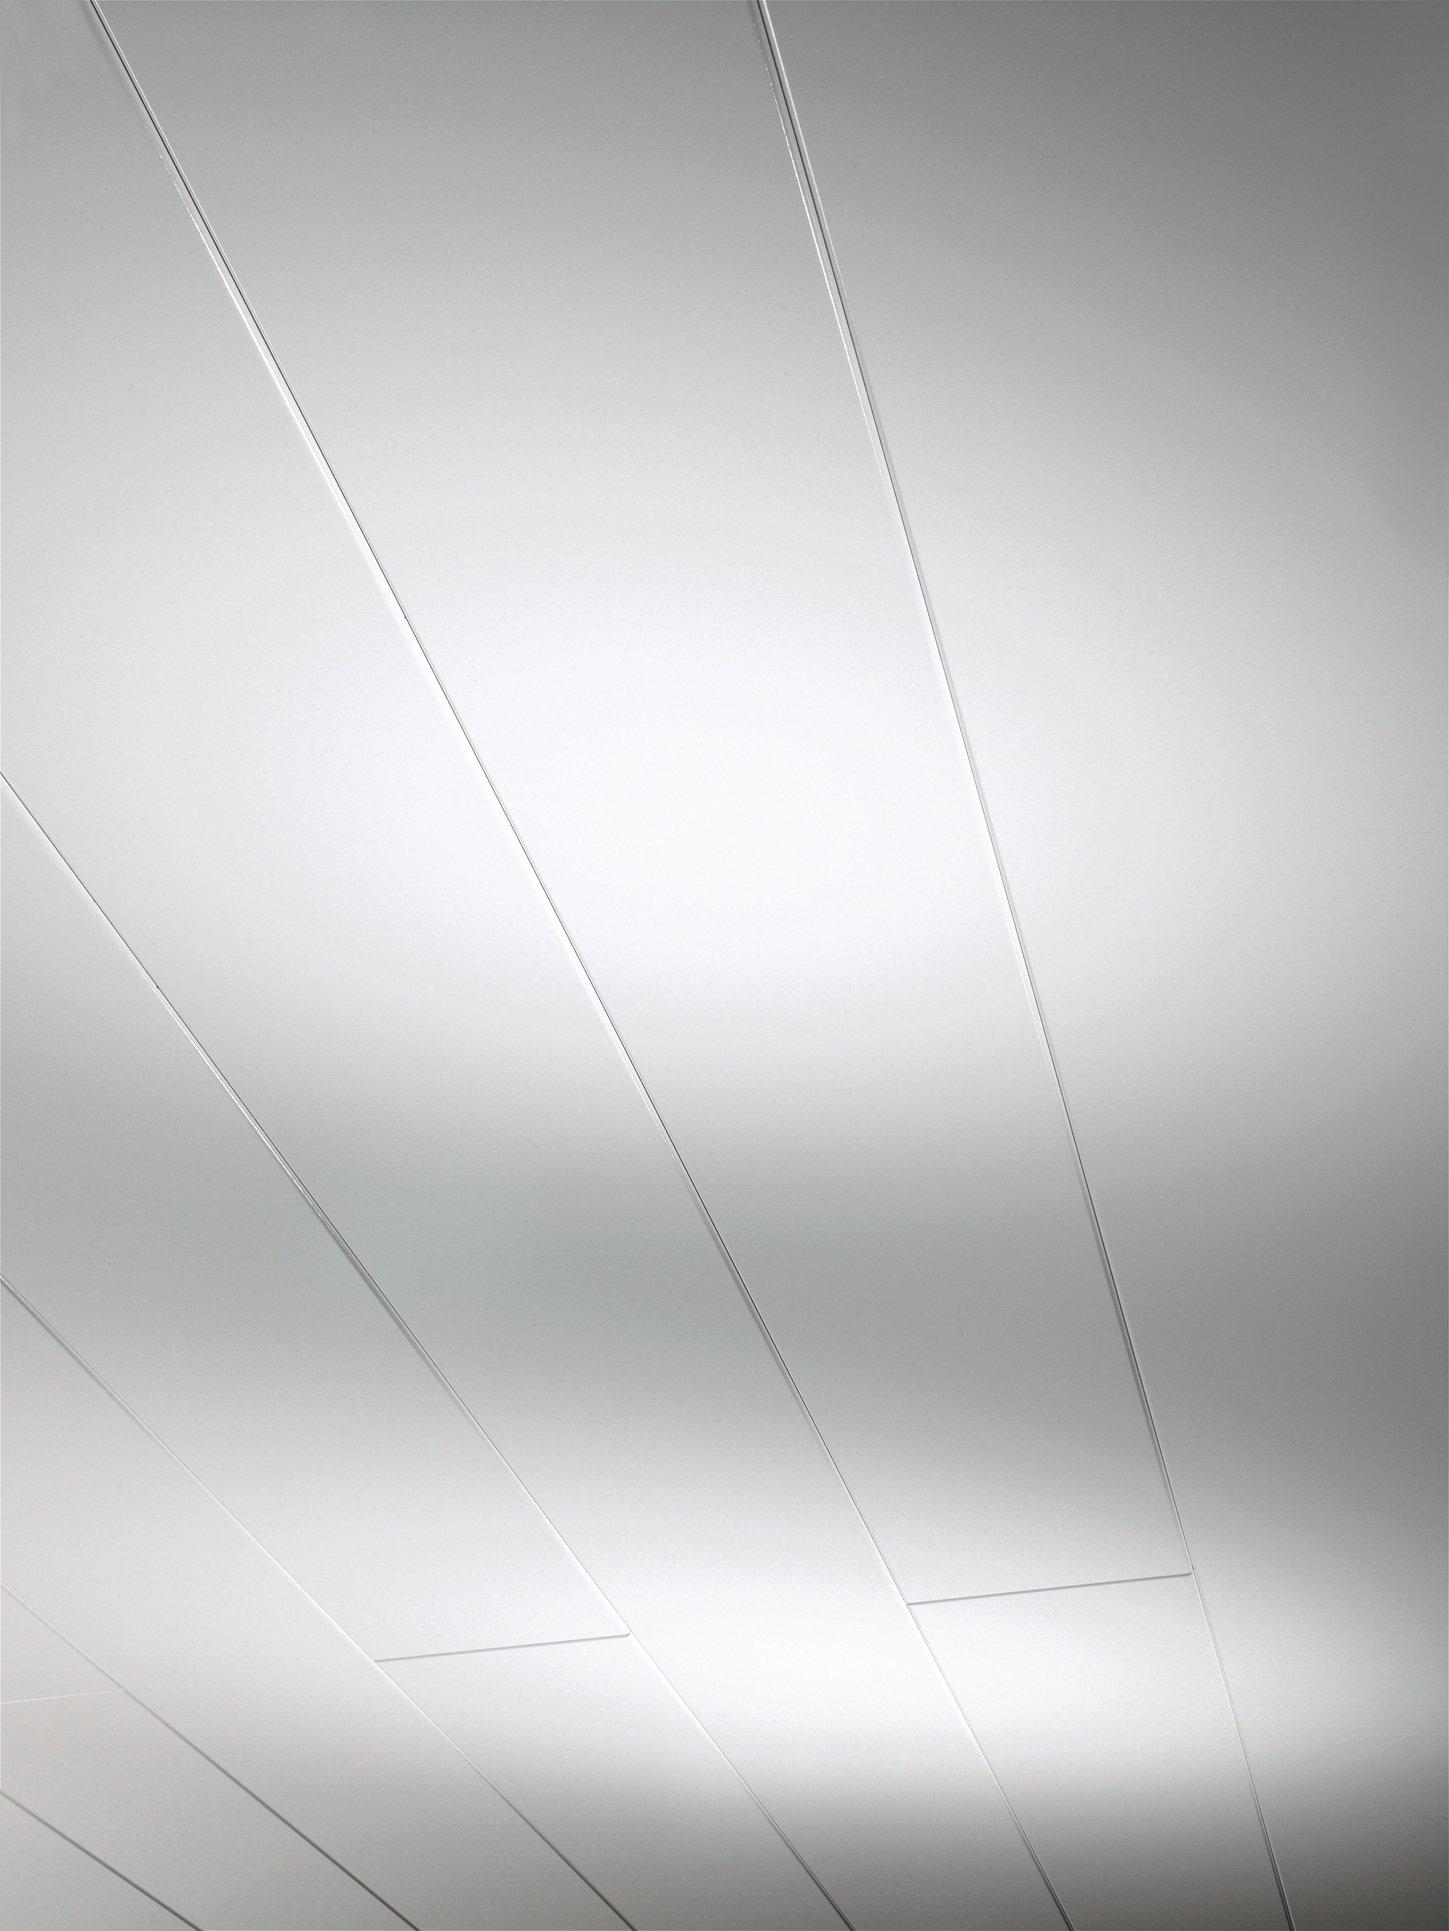 Parador Bekledingspaneel »Novara«, witte hoogglans, 6 panelen 1,5 m goedkoop op otto.nl kopen